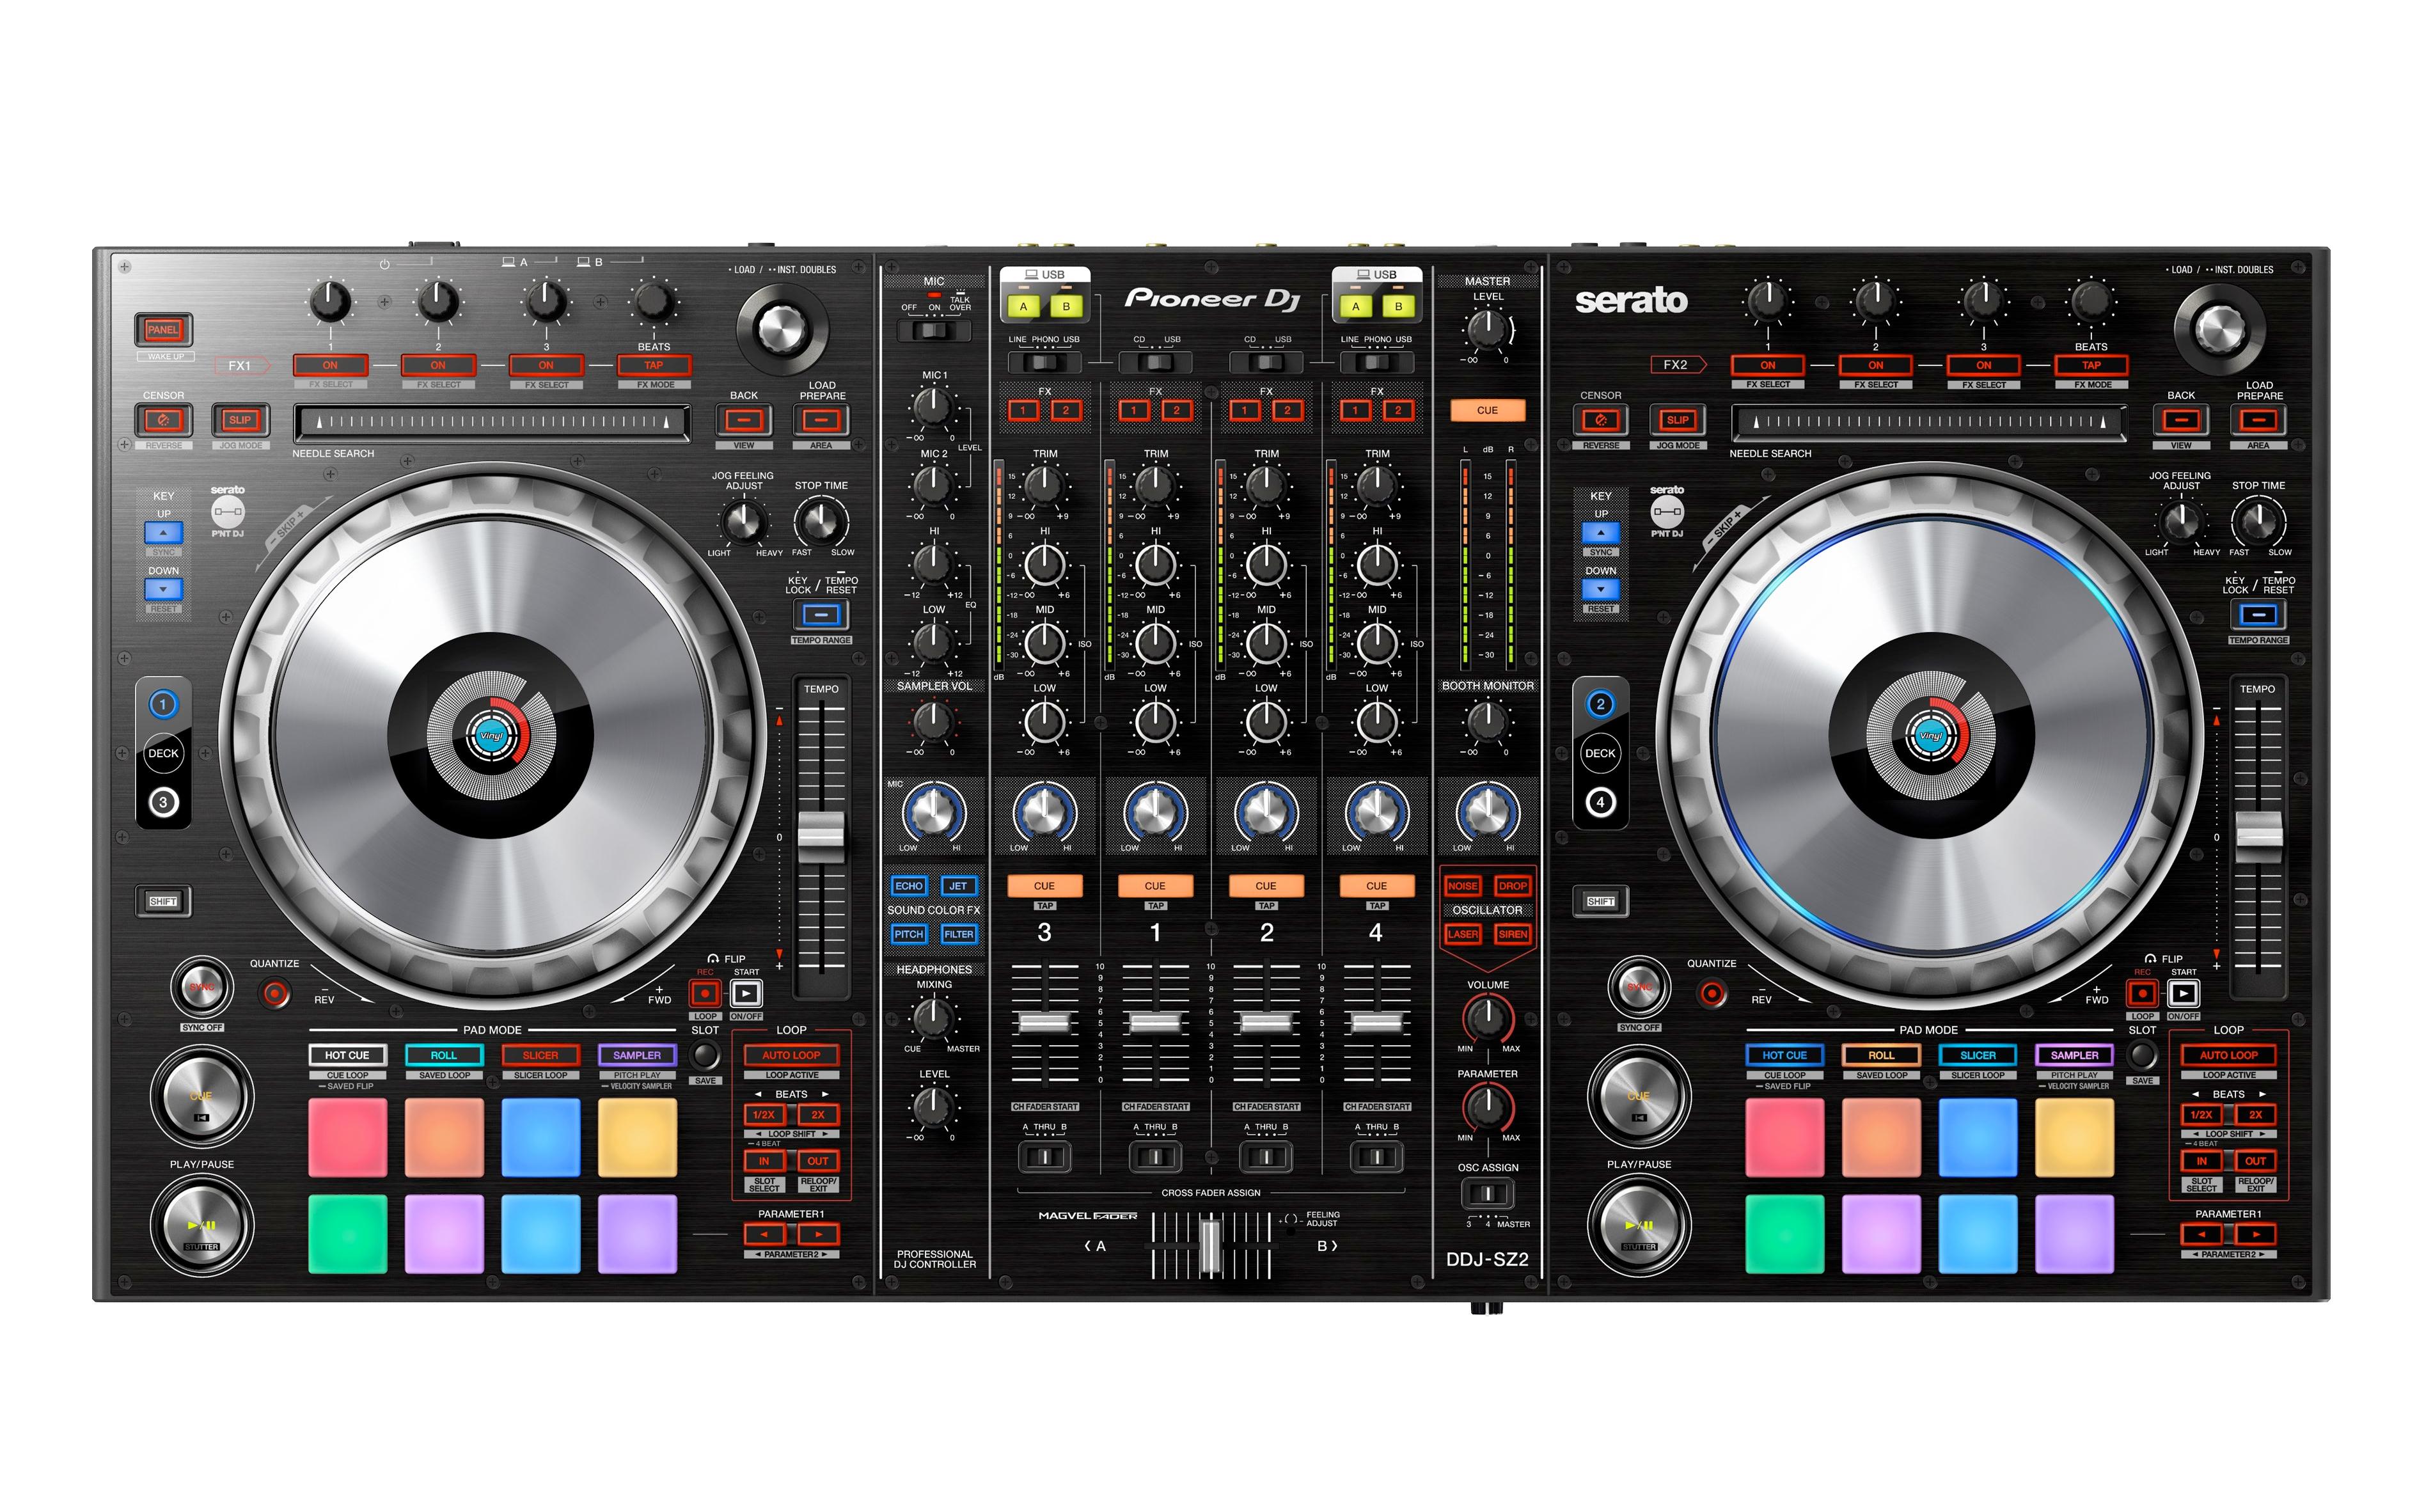 Pioneer DJ DDJSZ2 Flagship 4 Channel Serato DJ Controller